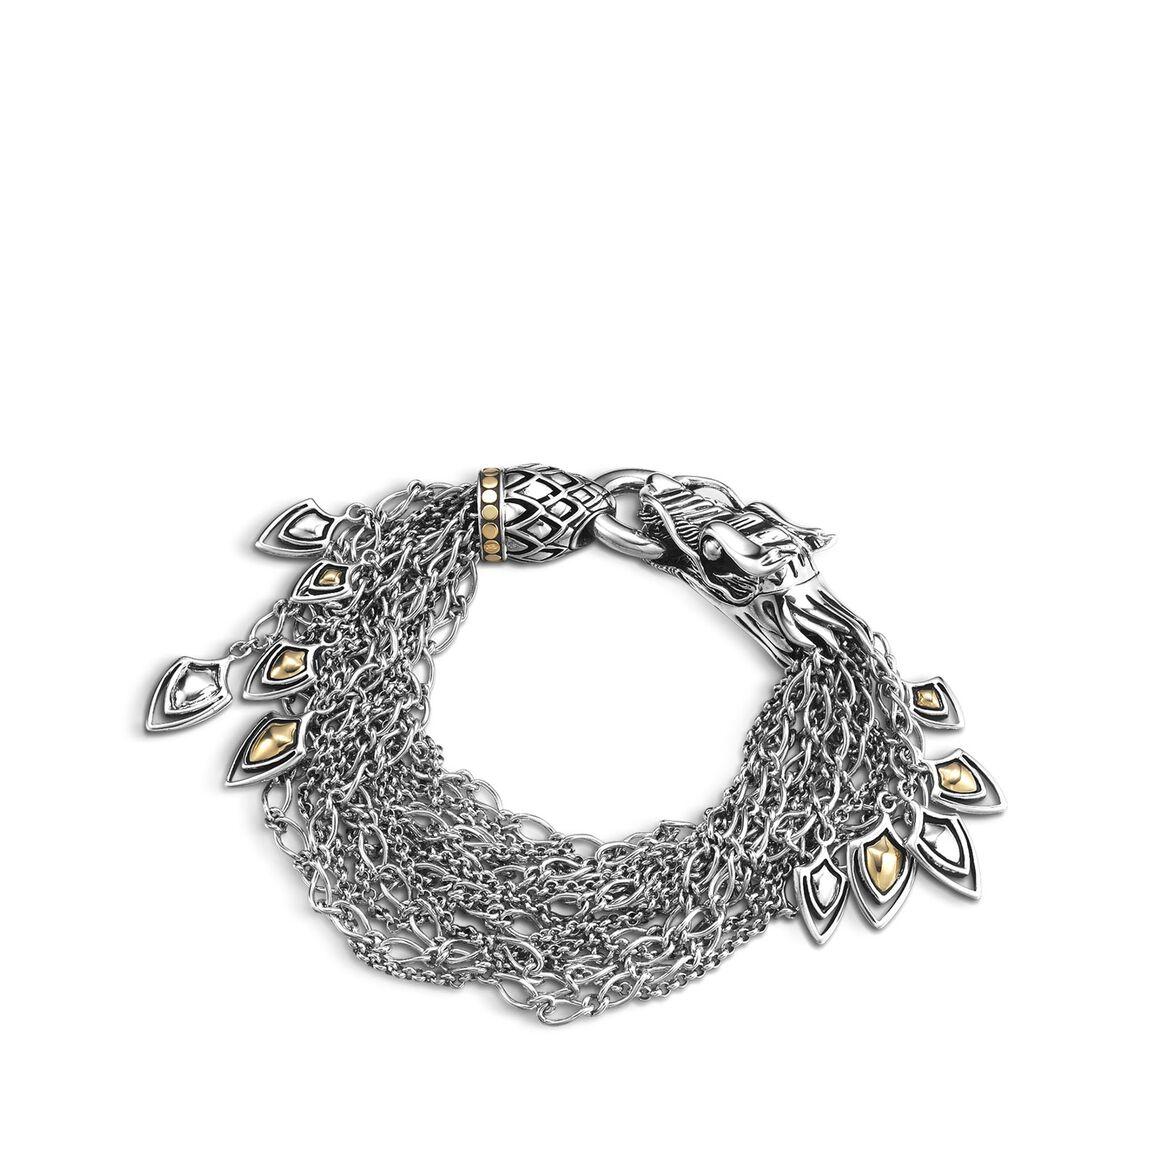 Legends Naga Multi Row Bracelet in Silver and 18K Gold